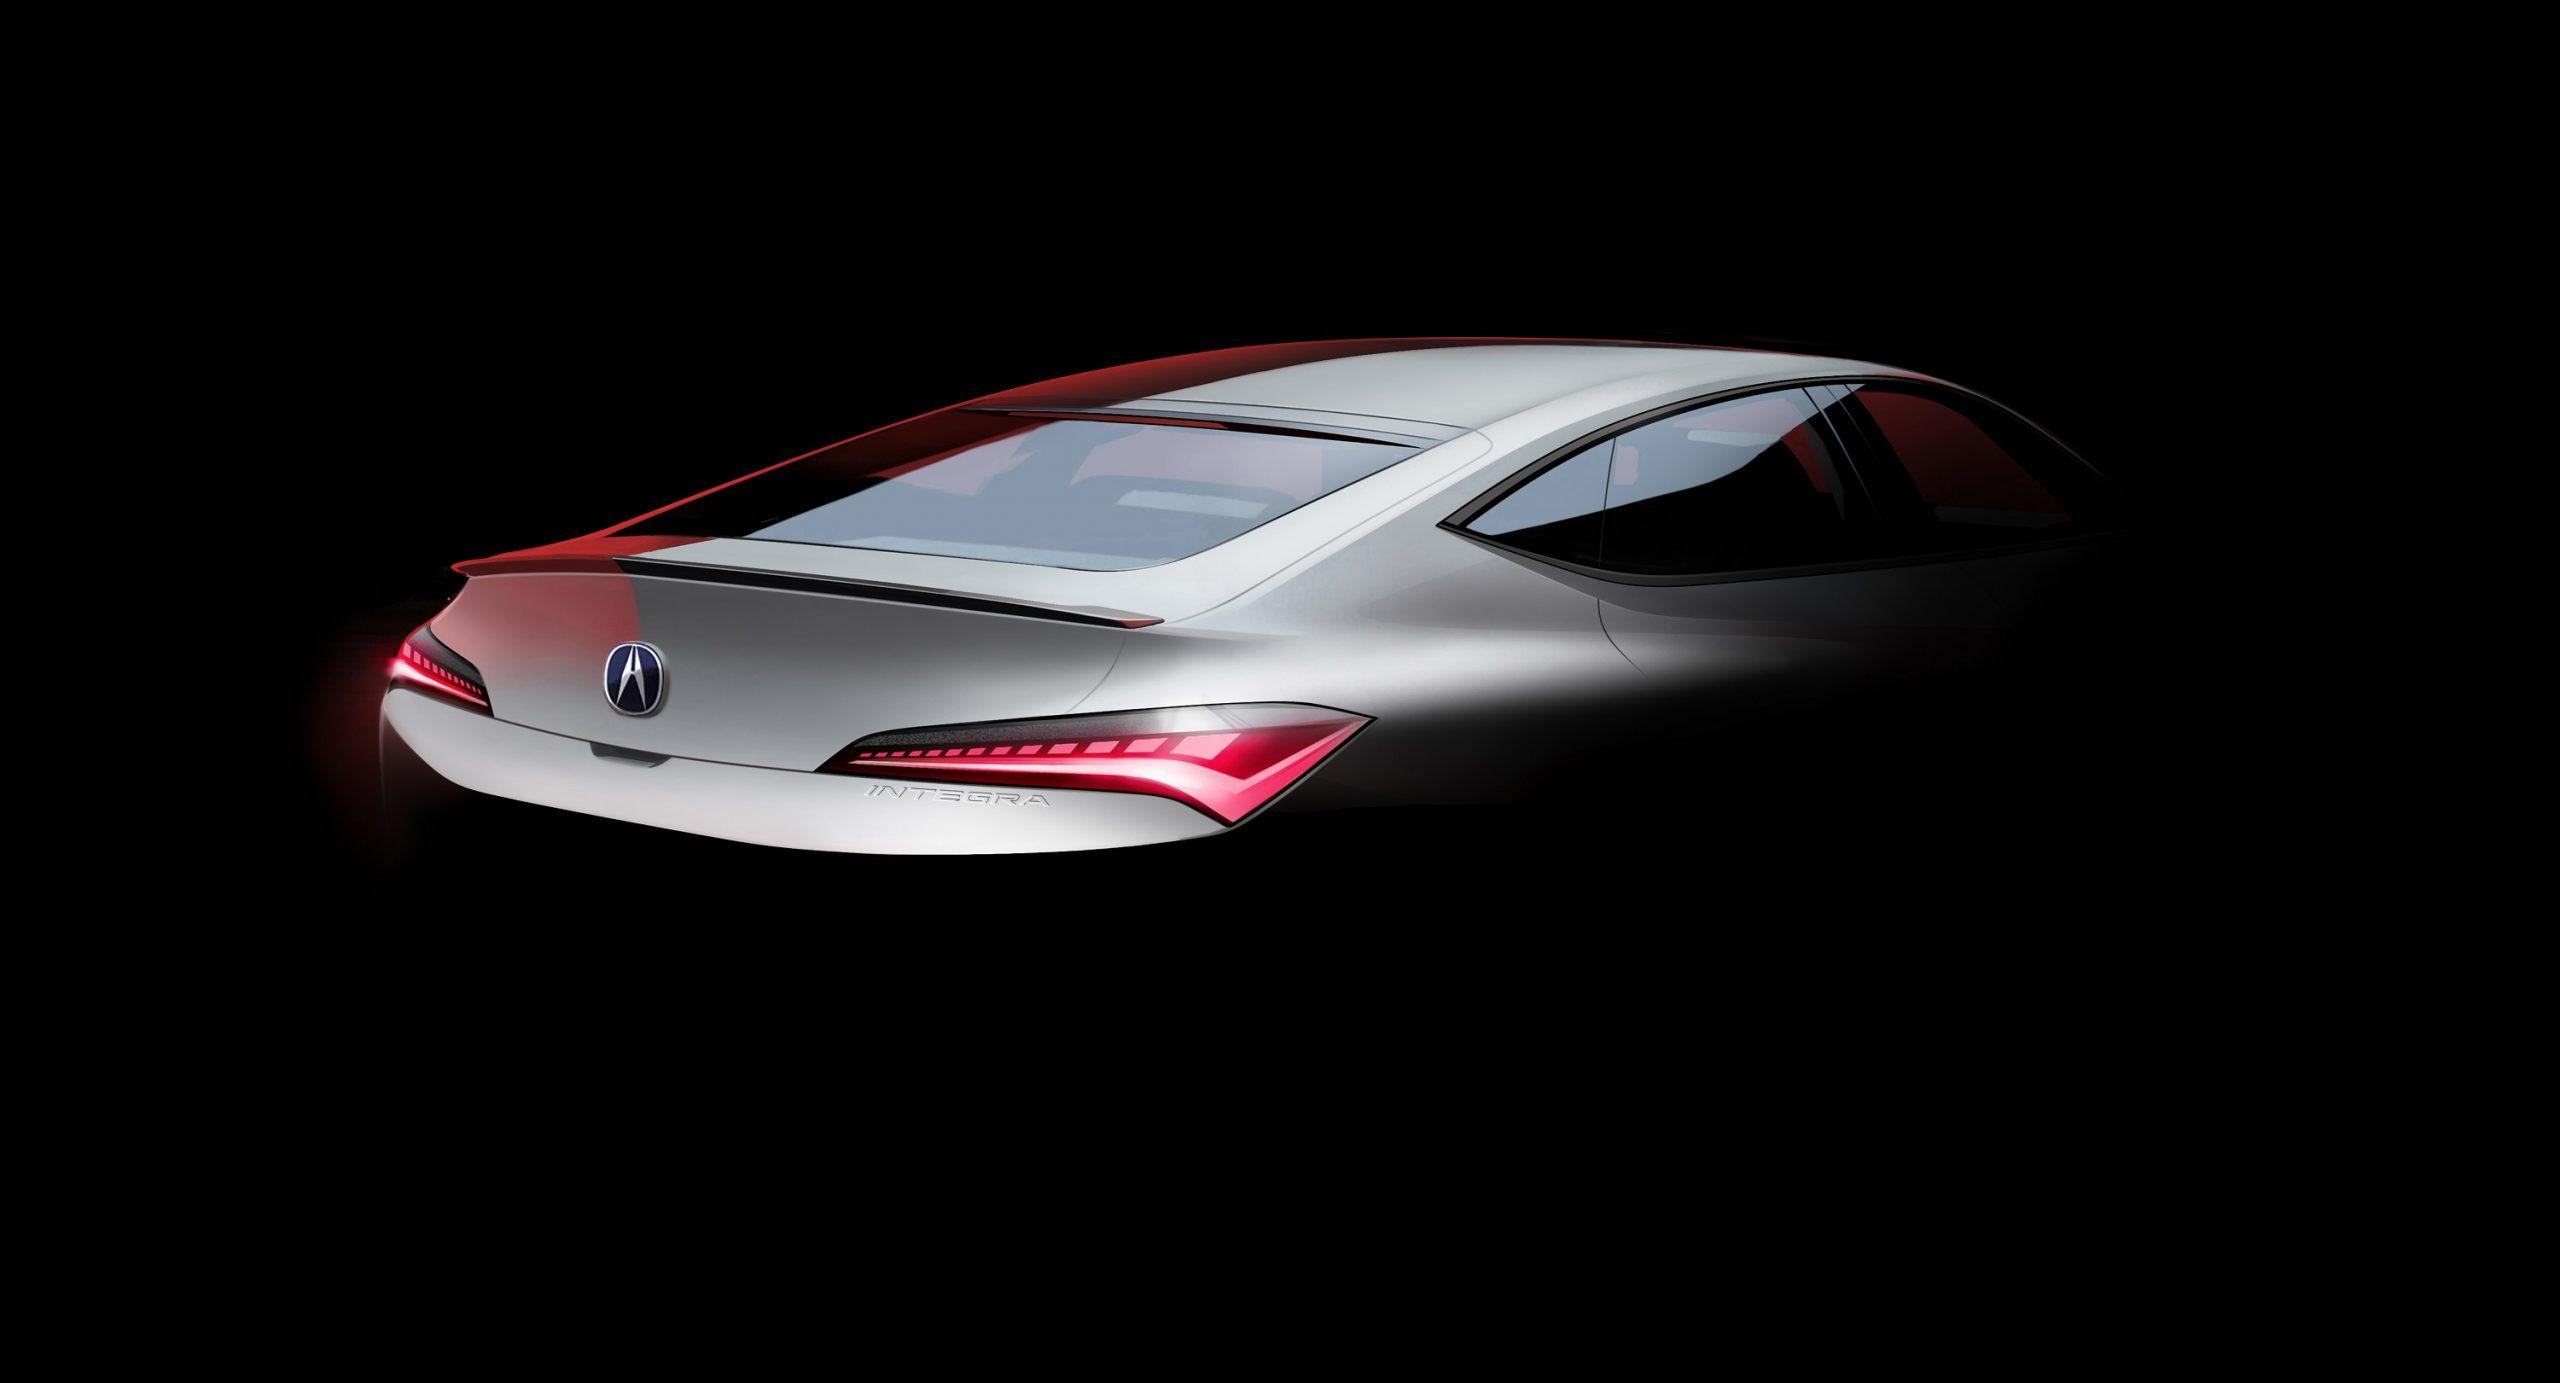 The rear 3/4 of a white 2022 Acura Integra